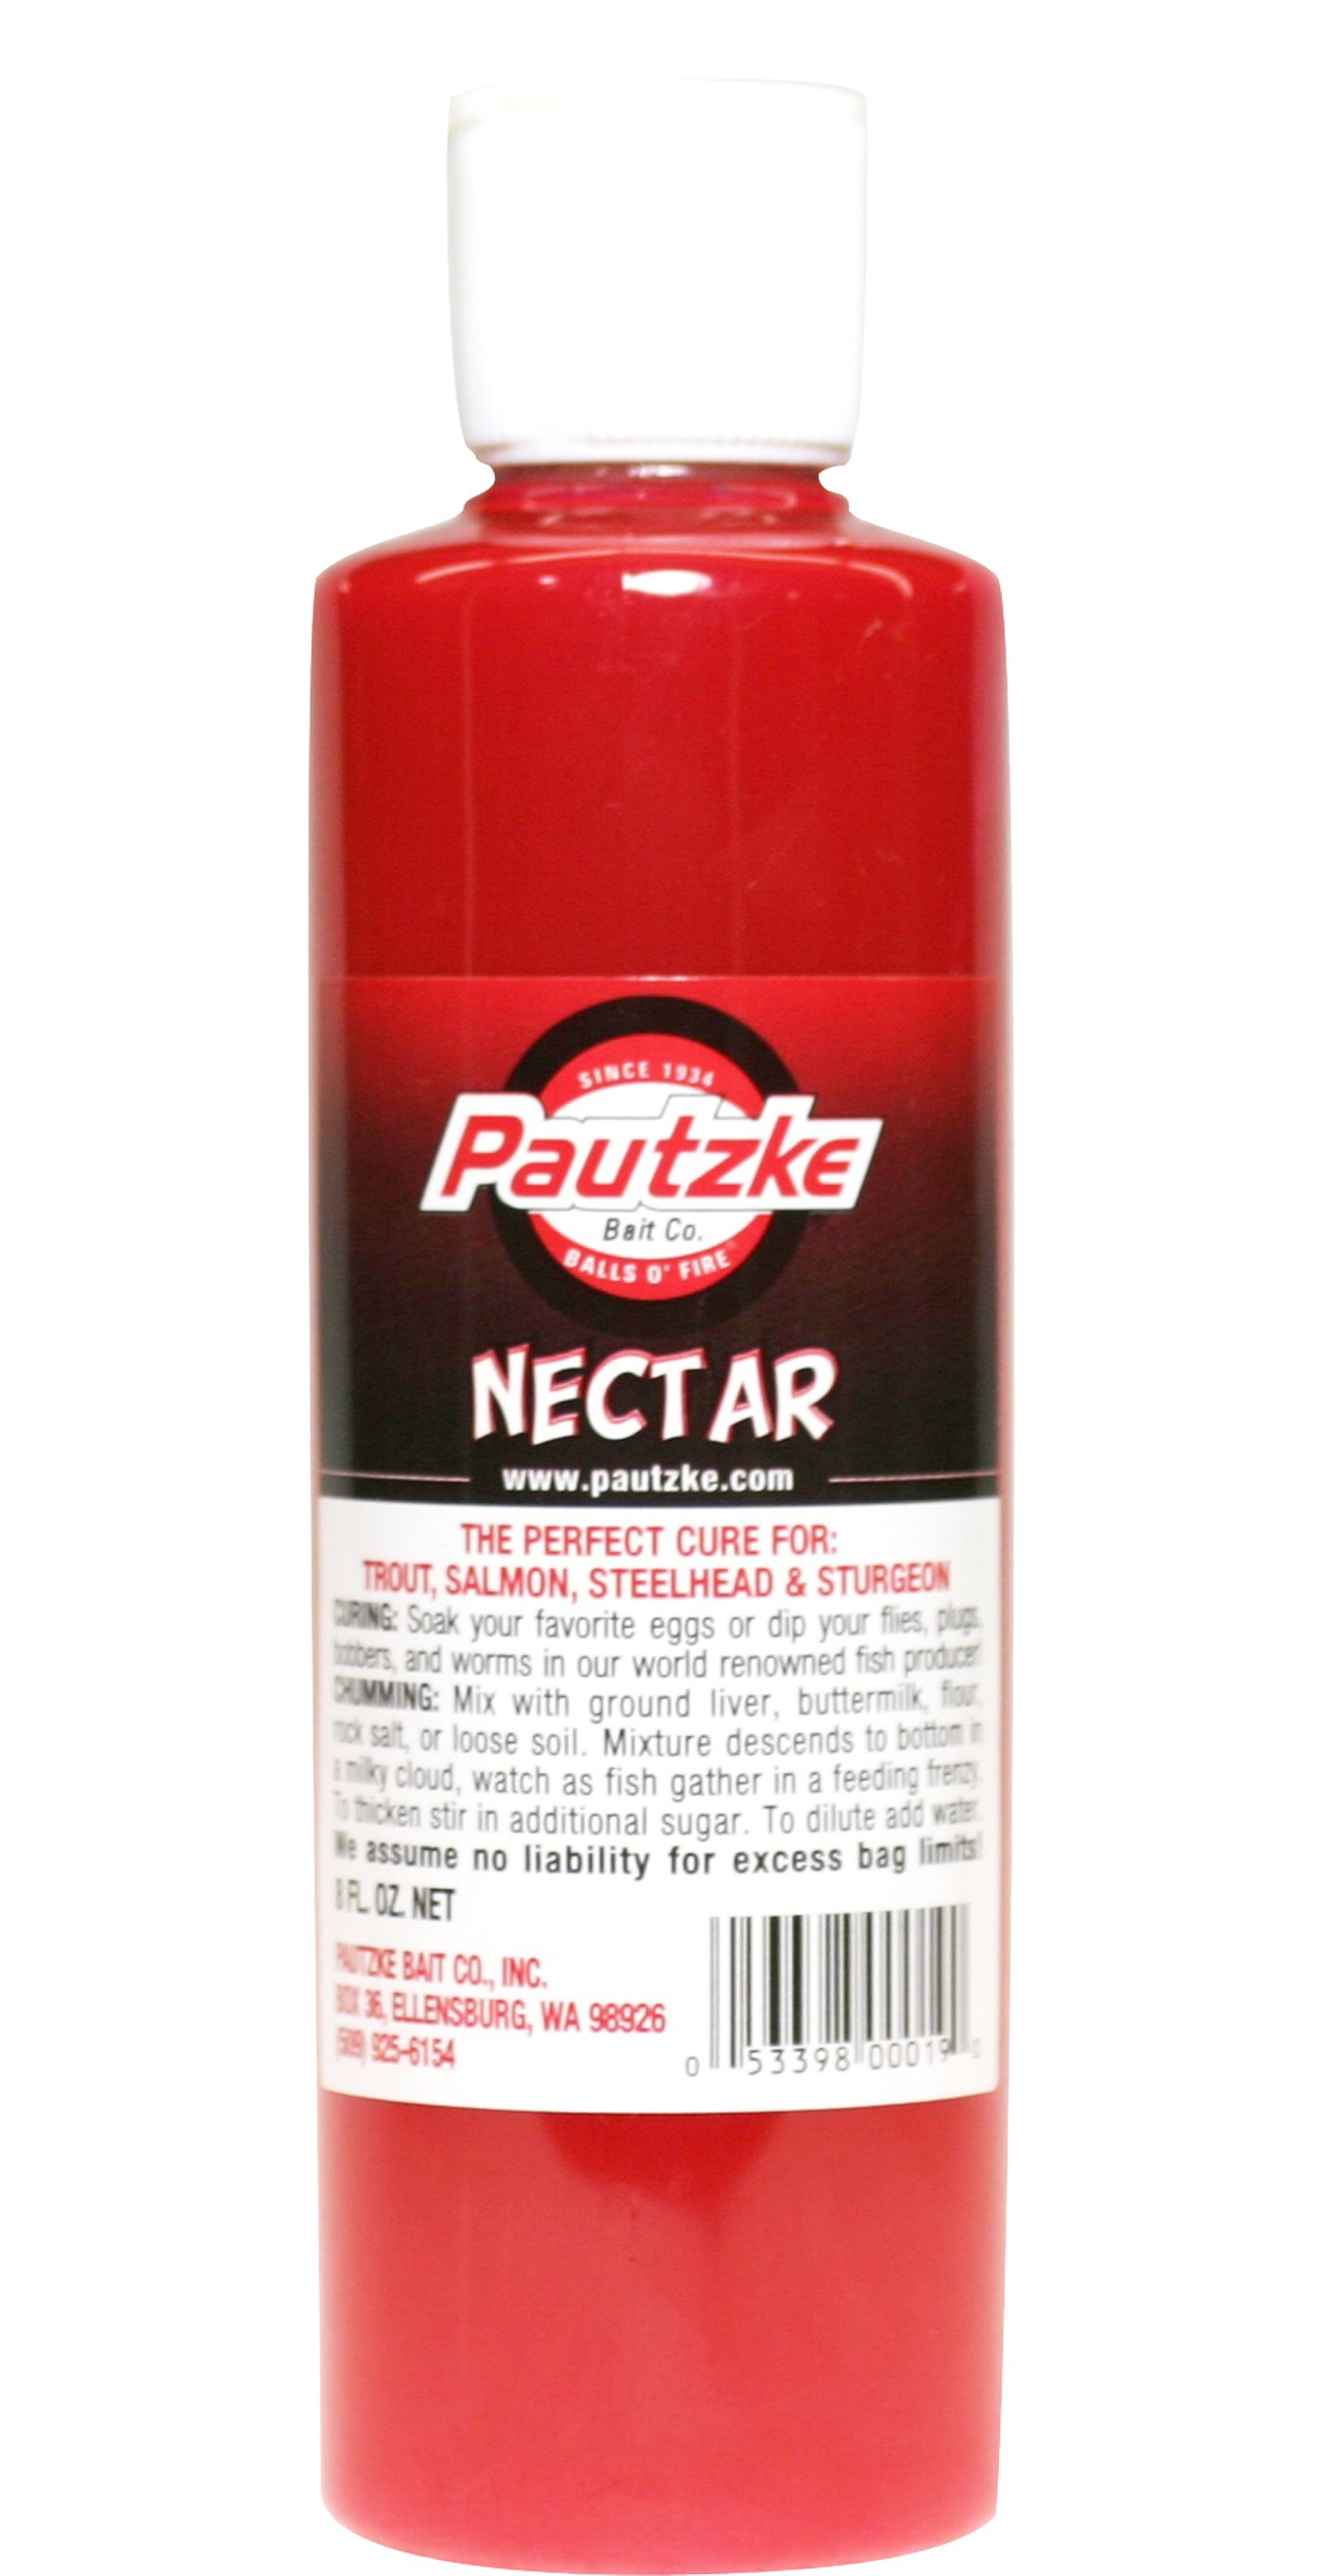 Pautzke Nectar Fish Attractant